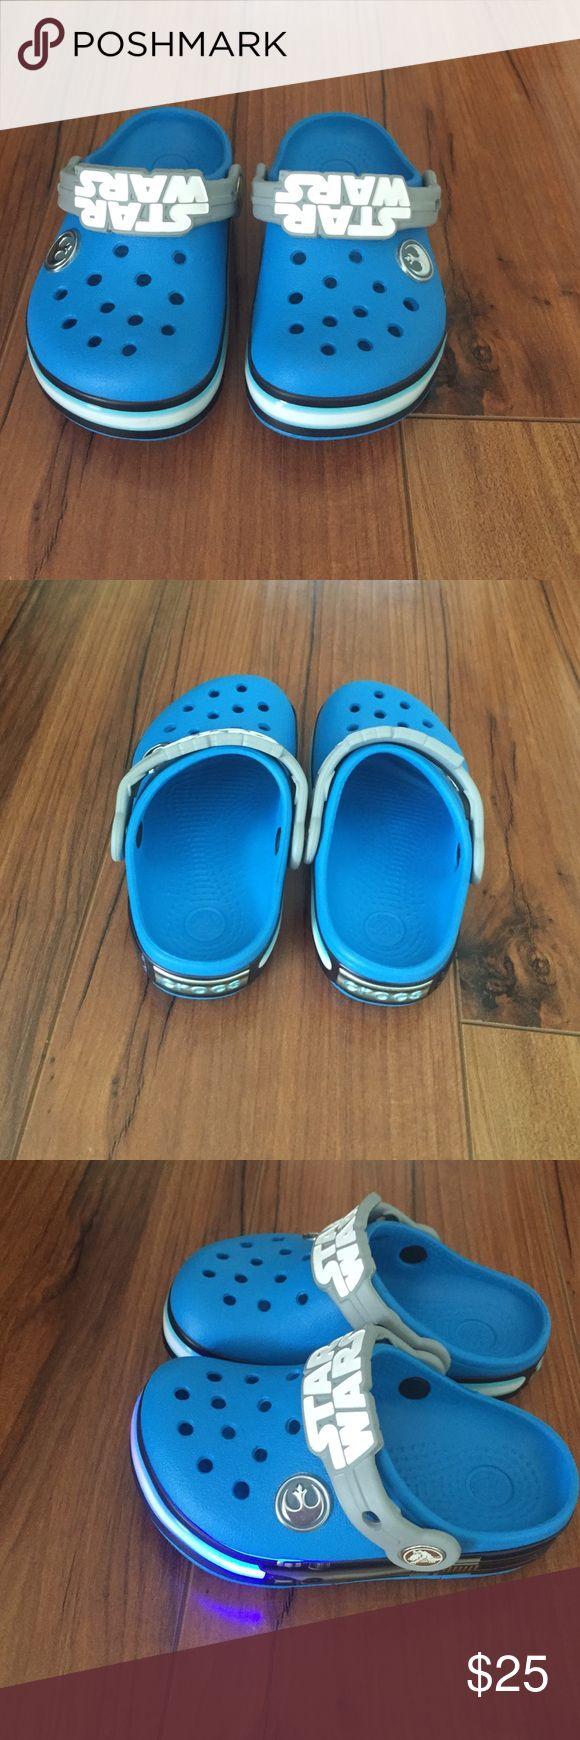 Boys crocs Toddler crocs for sale. They never been worn! Sparkling when walking! Brand new! CROCS Shoes Sandals & Flip Flops